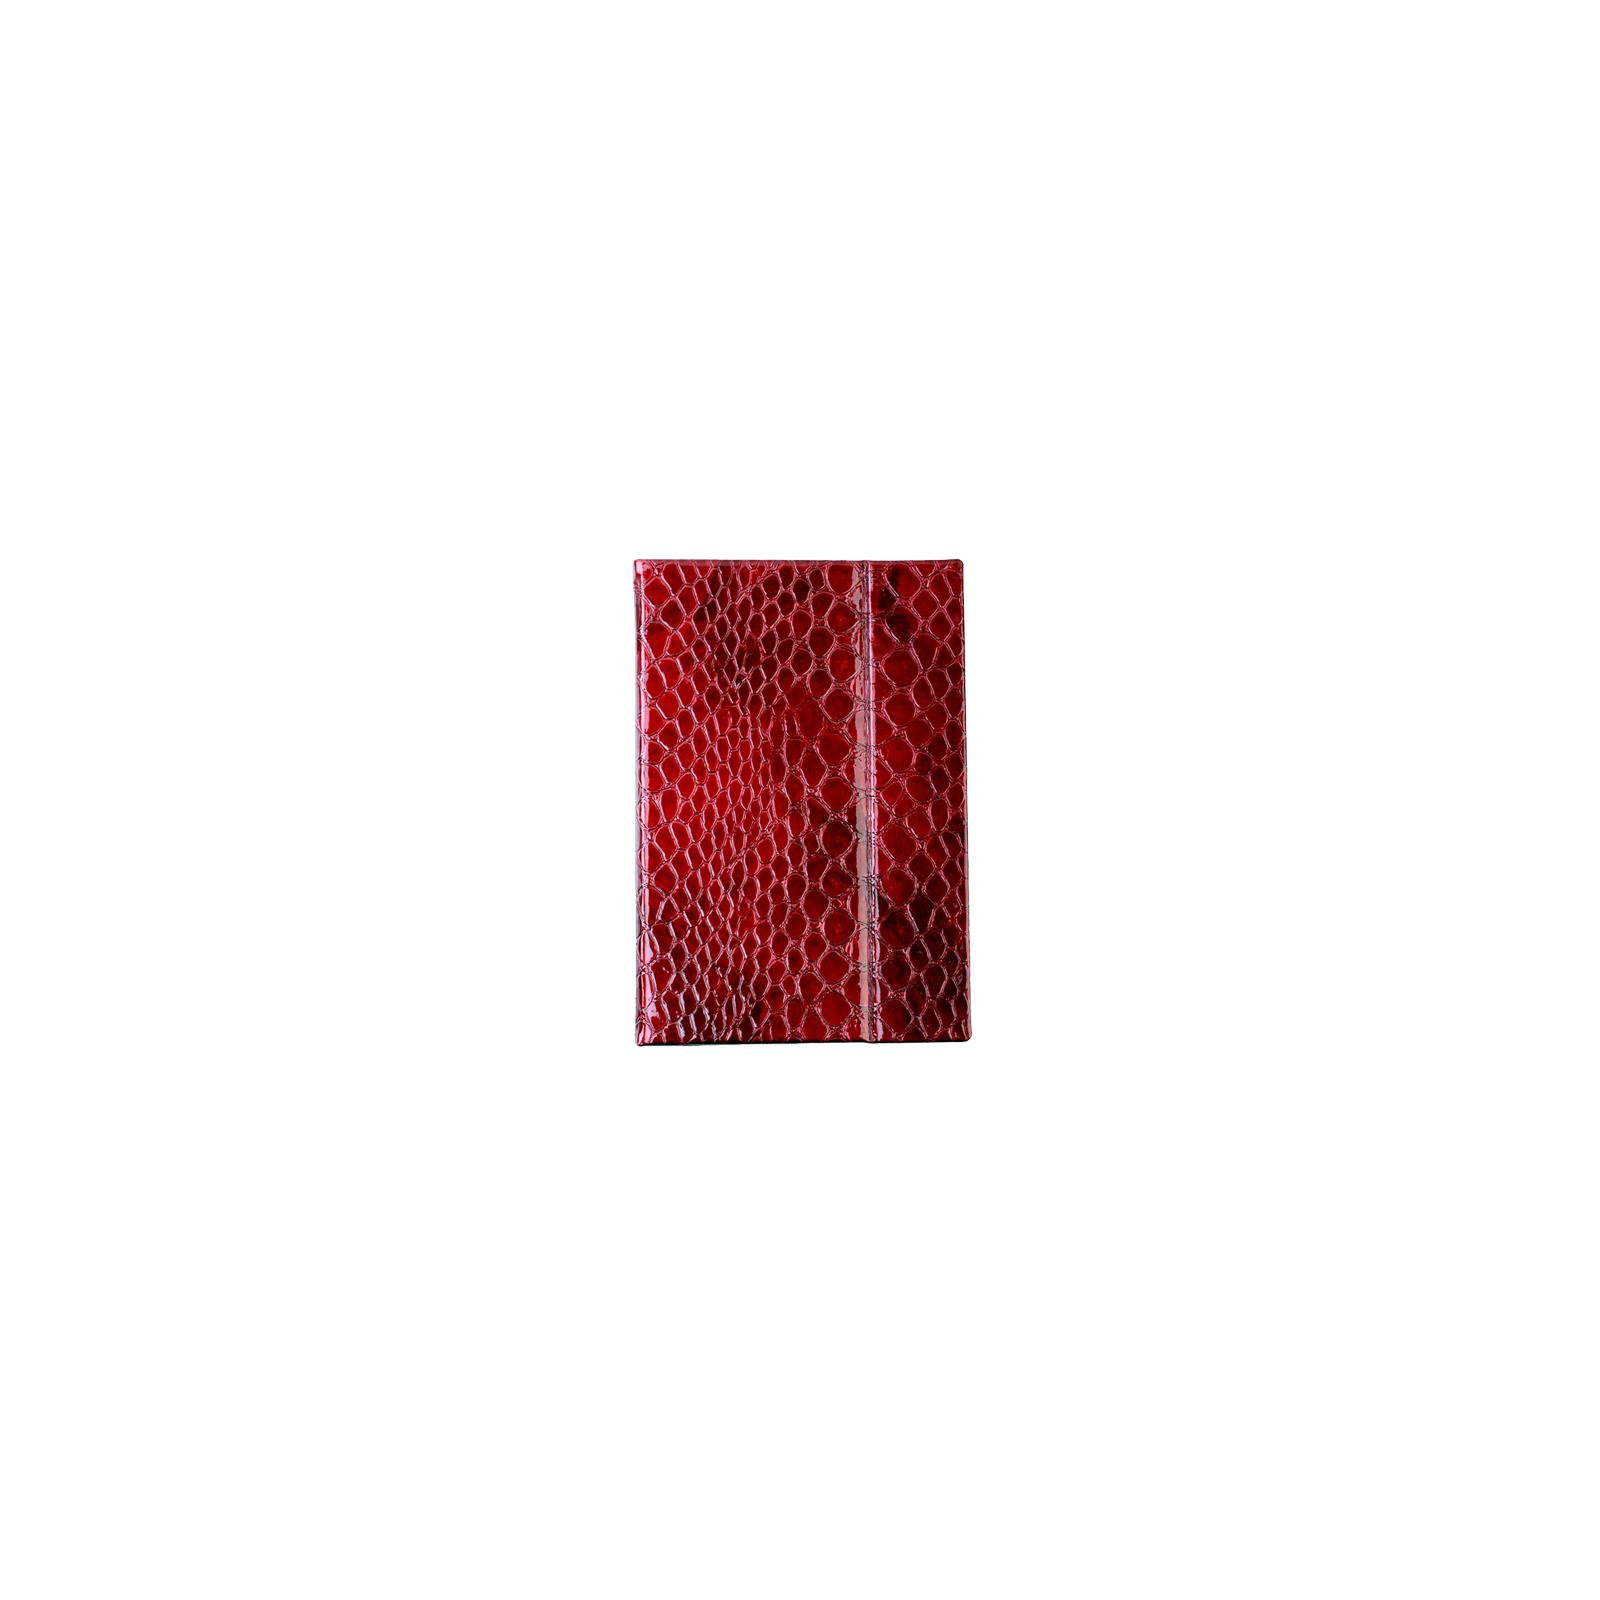 Чехол для планшета Vento 8 Desire glossy - red reptile изображение 2